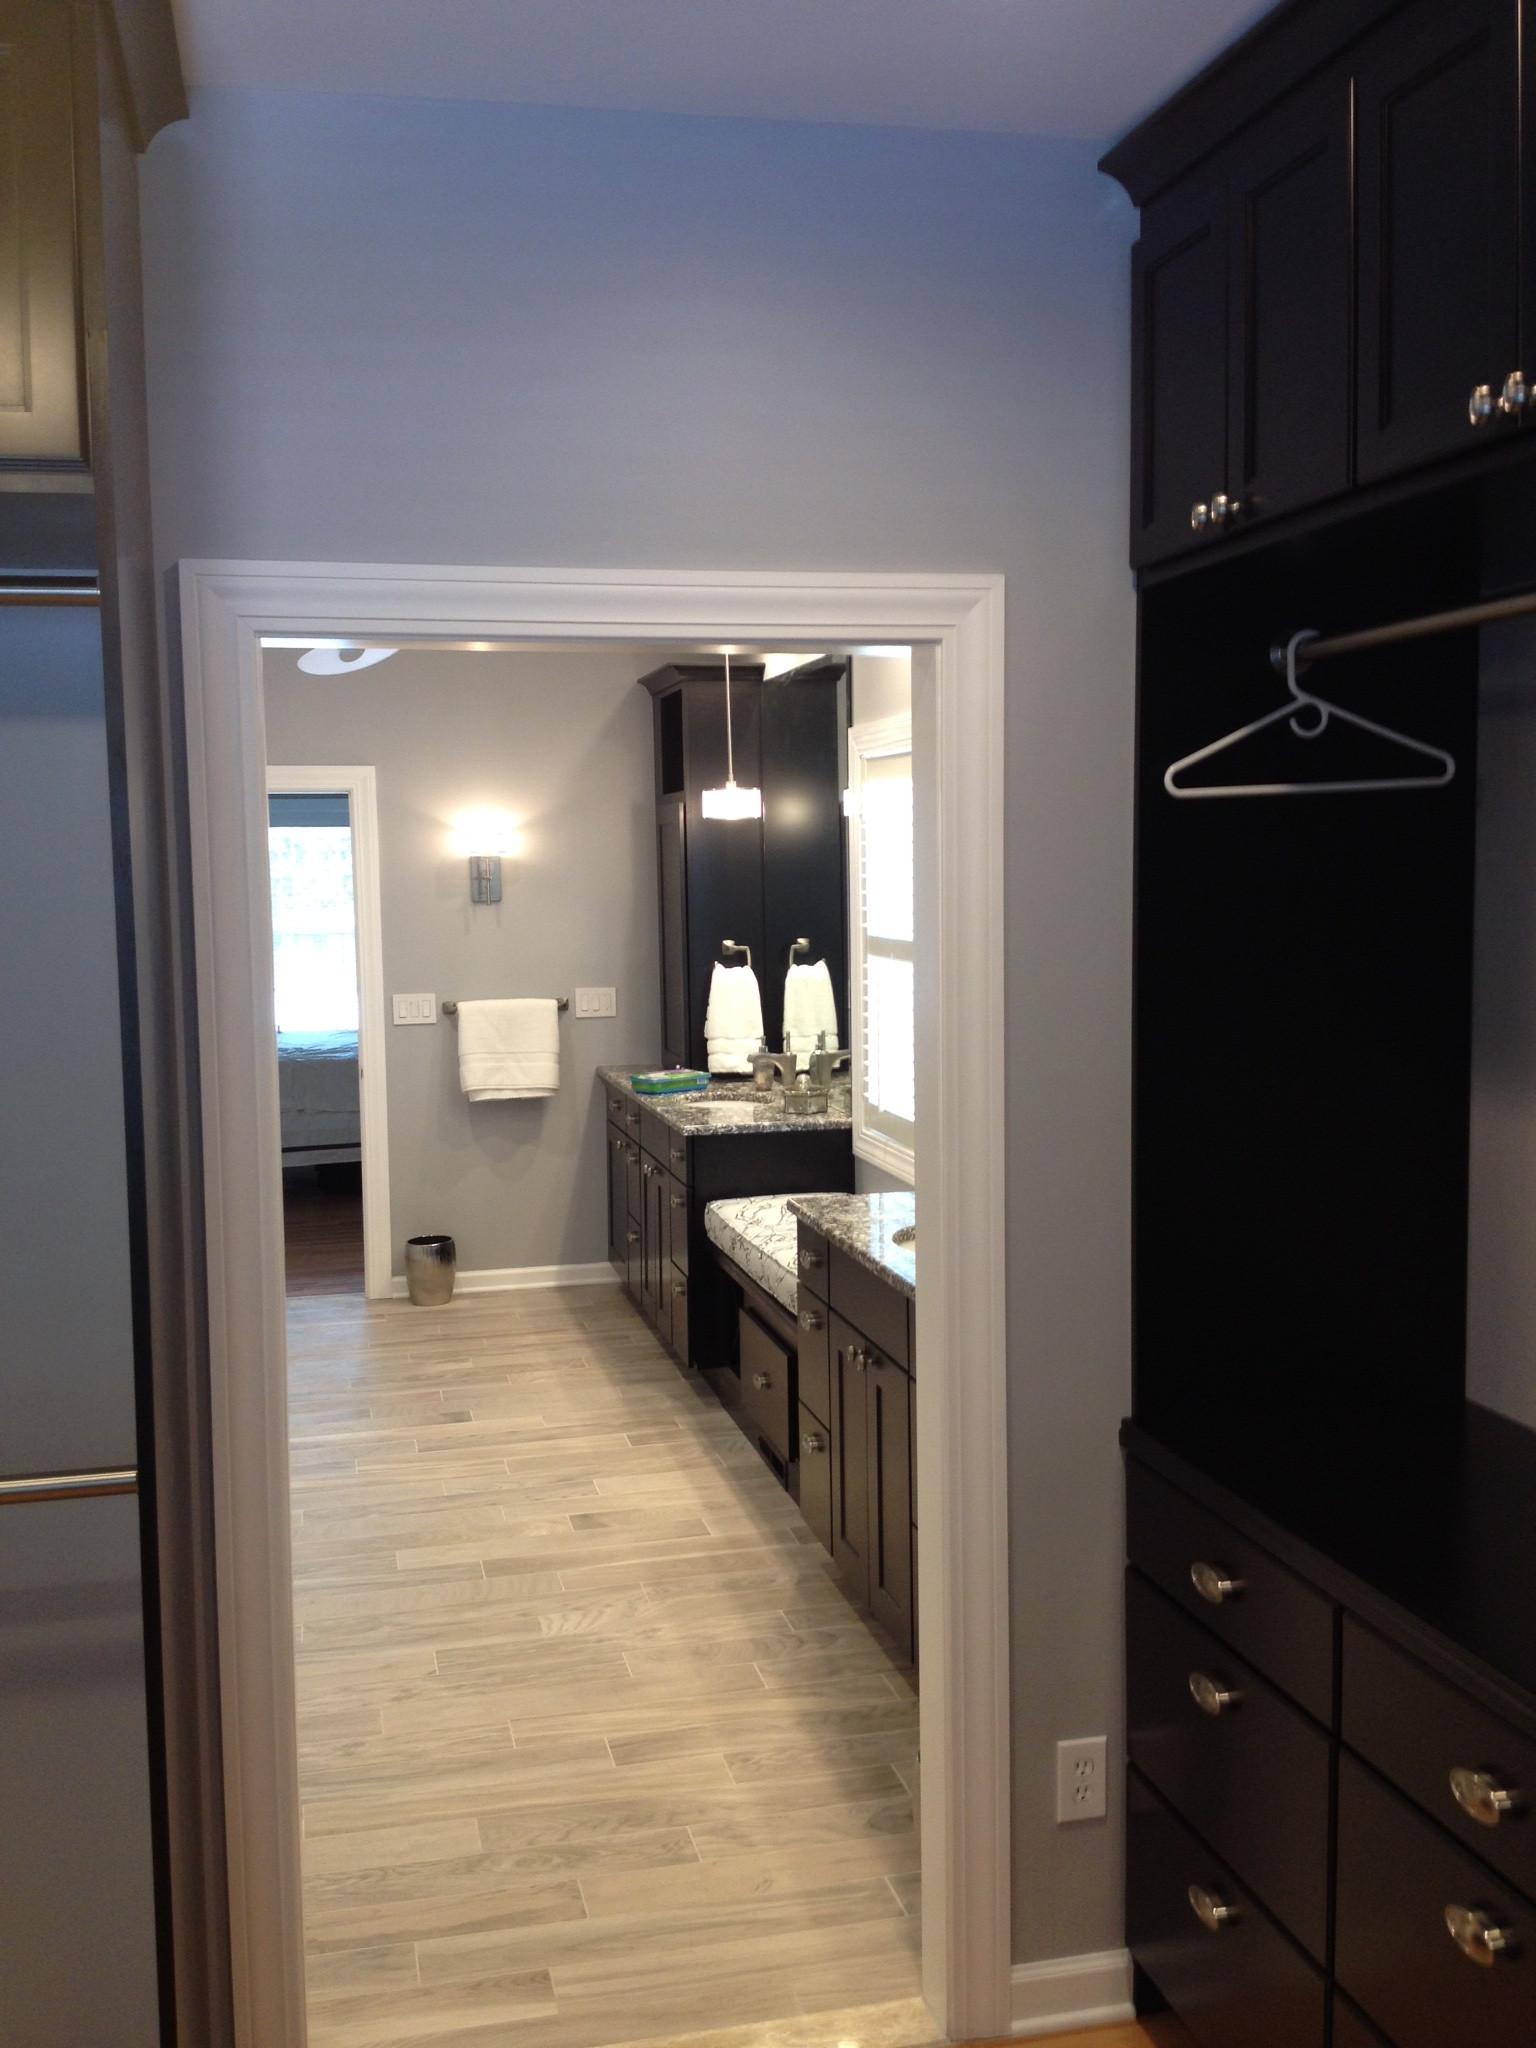 Rita and Dan; Master Bedroom and Bathroom, Remodel-After